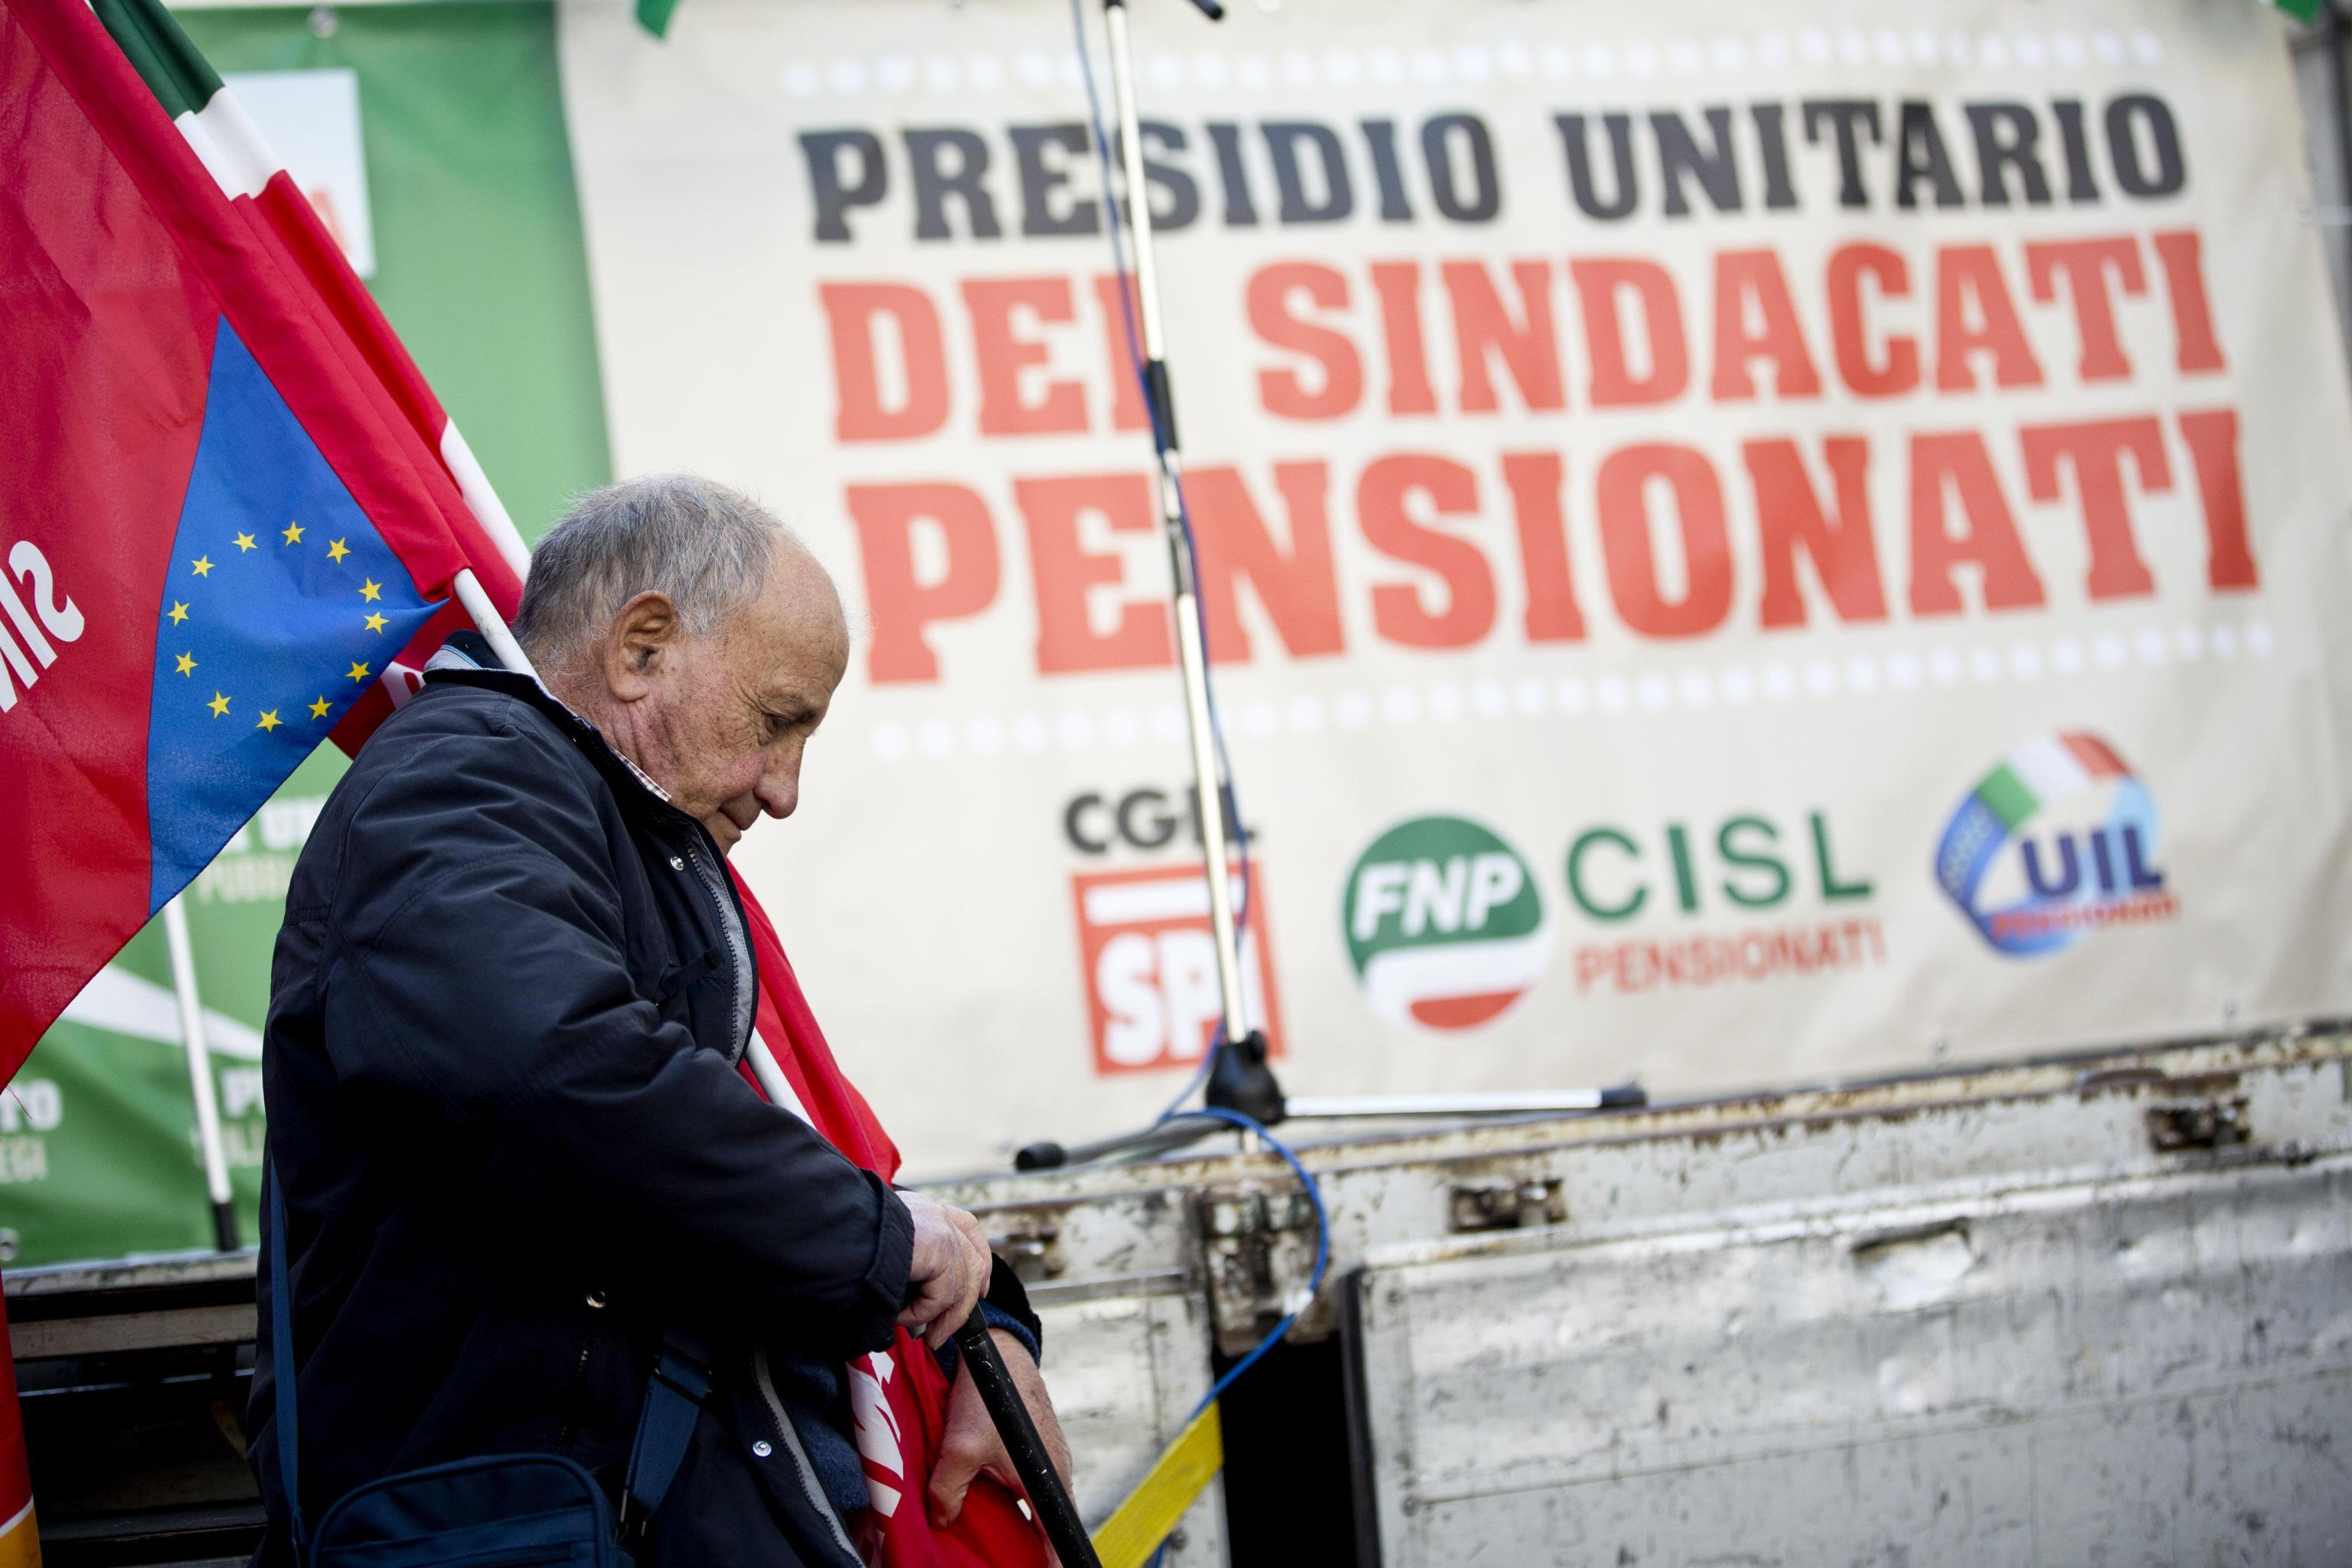 Pensioni: manifestazione a Firenze il 14 ottobre, sindacati in piazza per la flessibilità